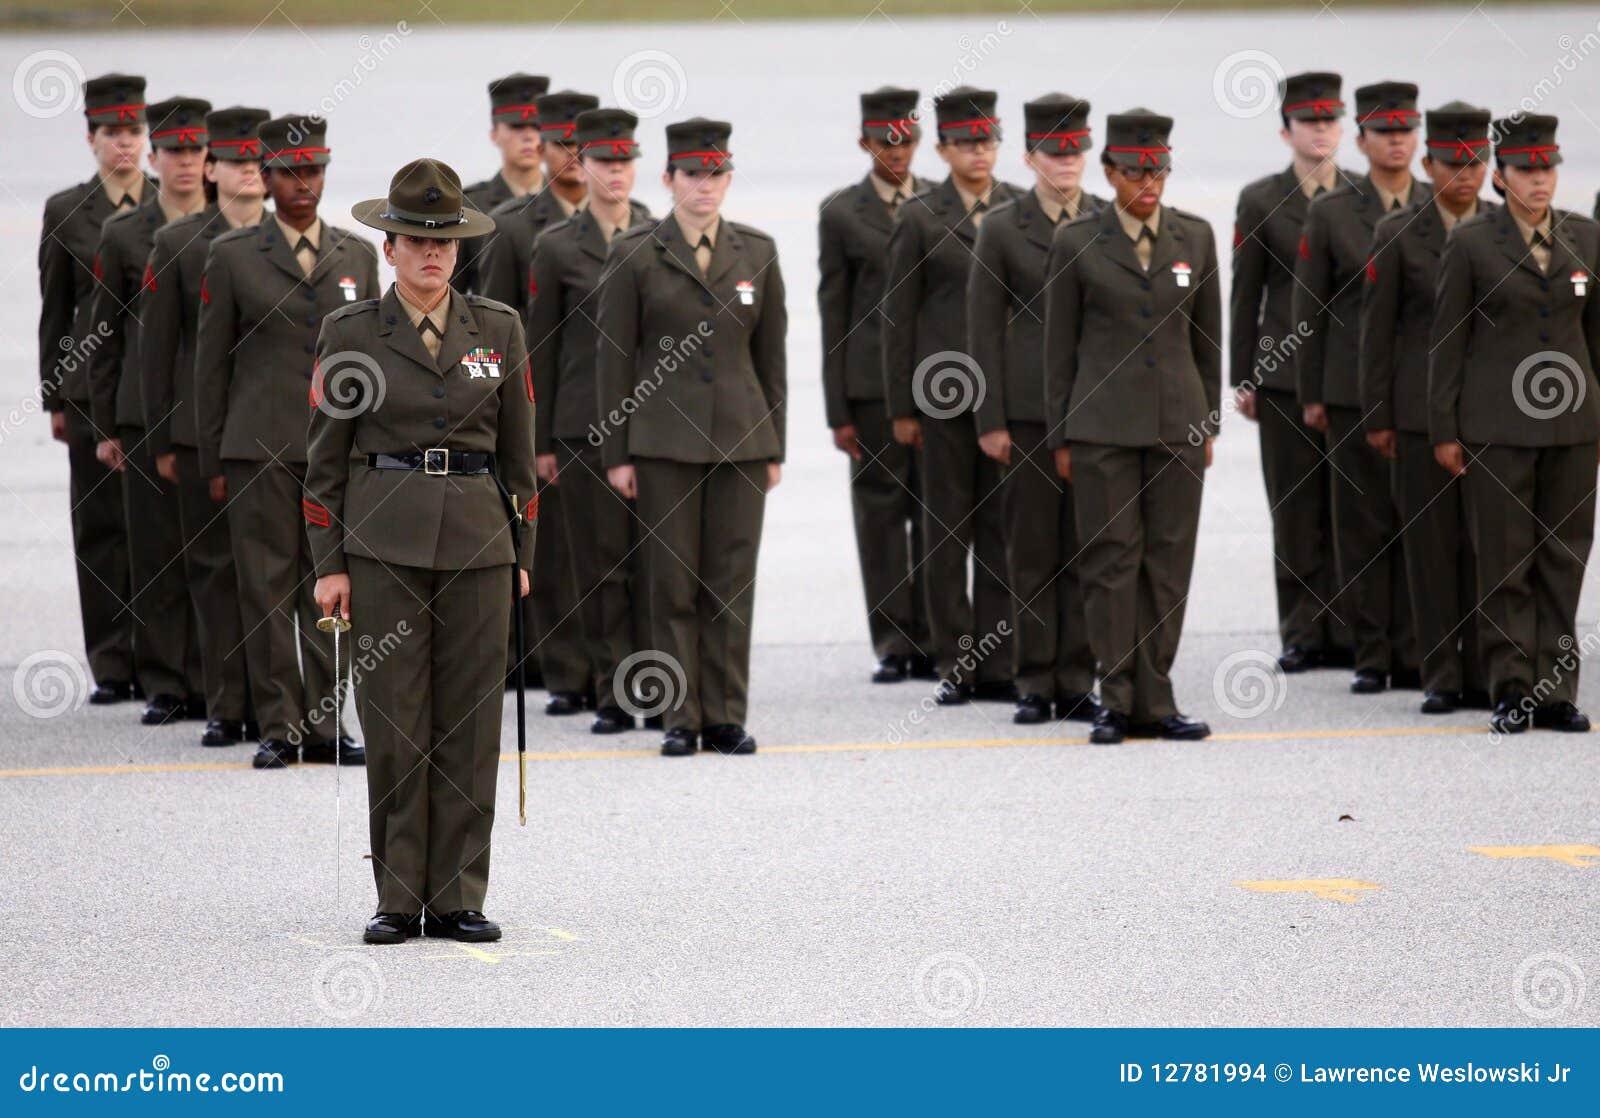 female united states marine corps graduates editorial stock image